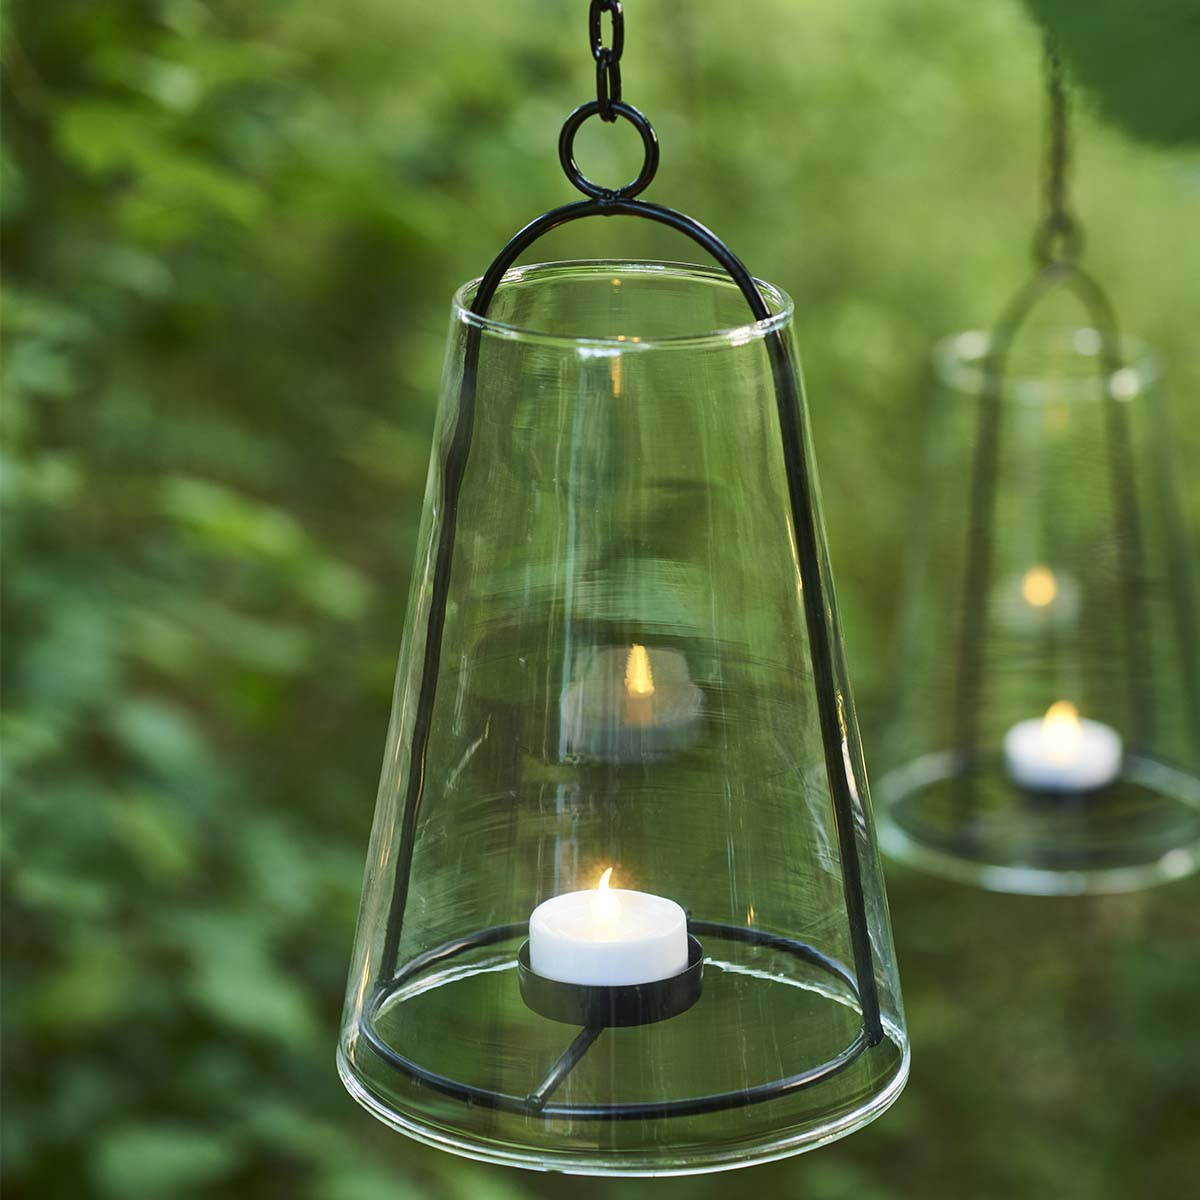 Lanterne Suspendue Albert H23cm noir